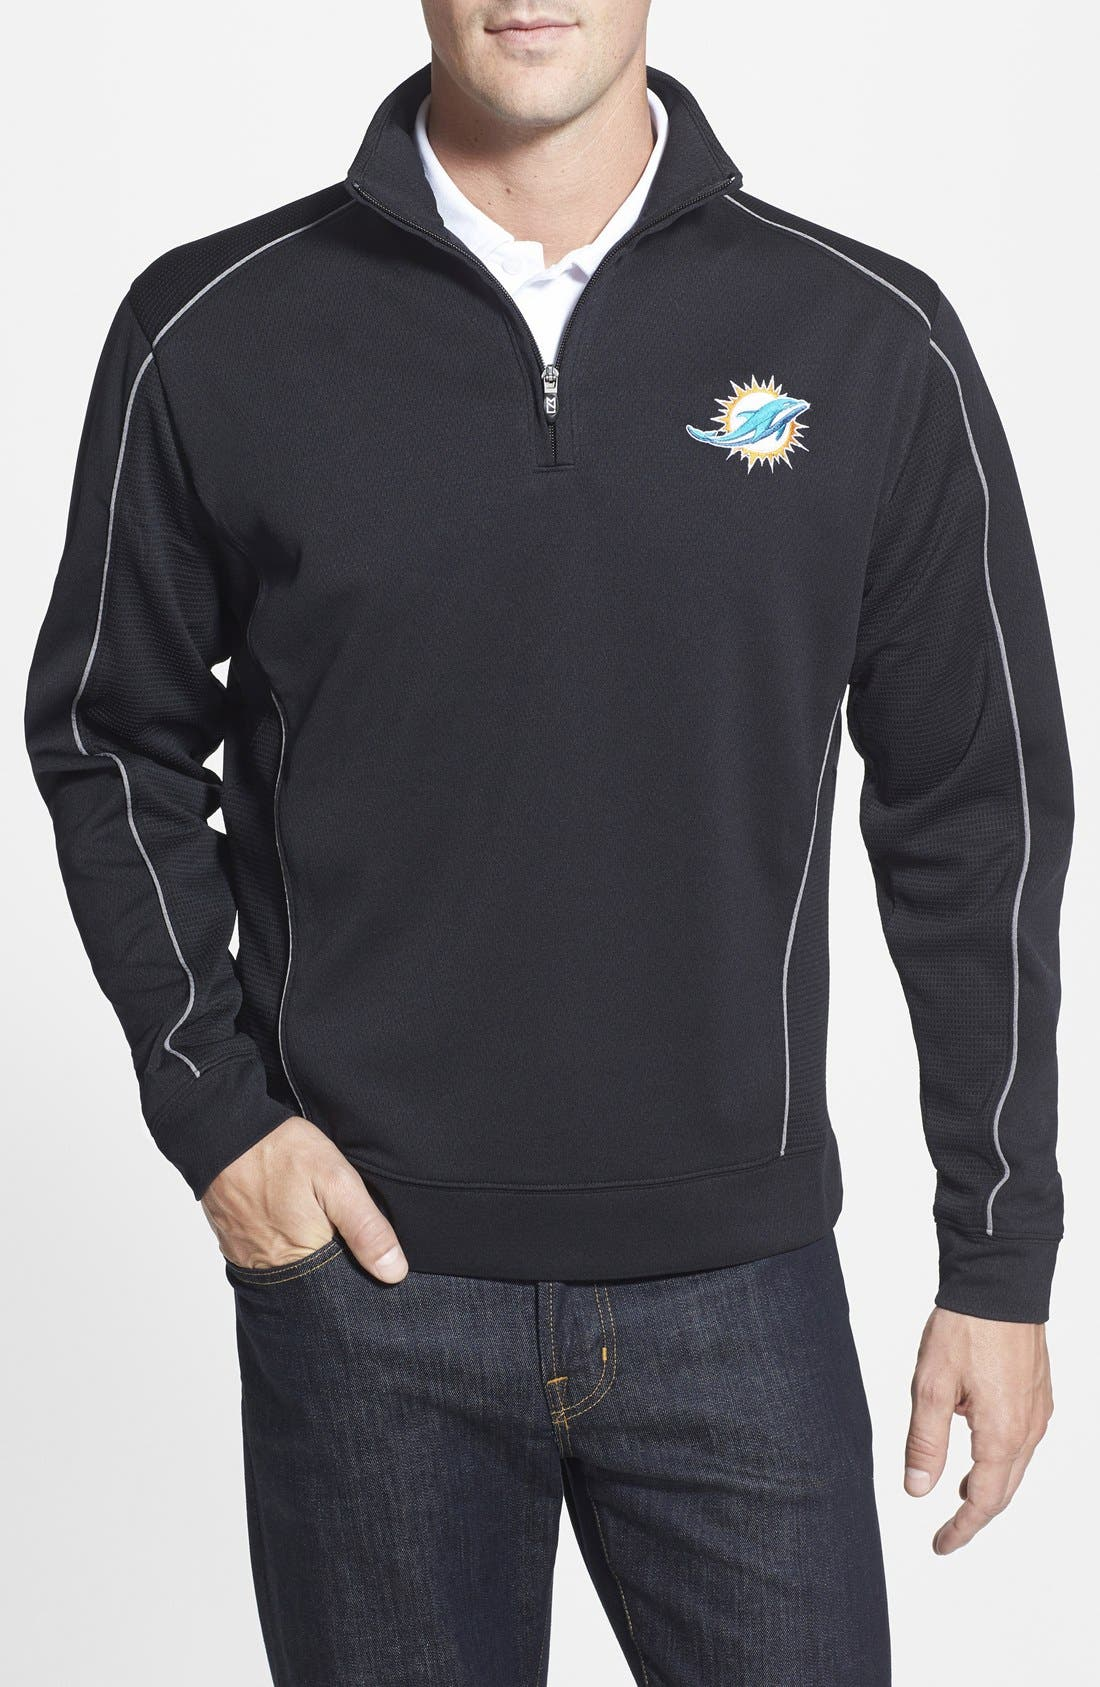 Miami Dolphins - Edge DryTec Moisture Wicking Half Zip Pullover,                         Main,                         color, Black